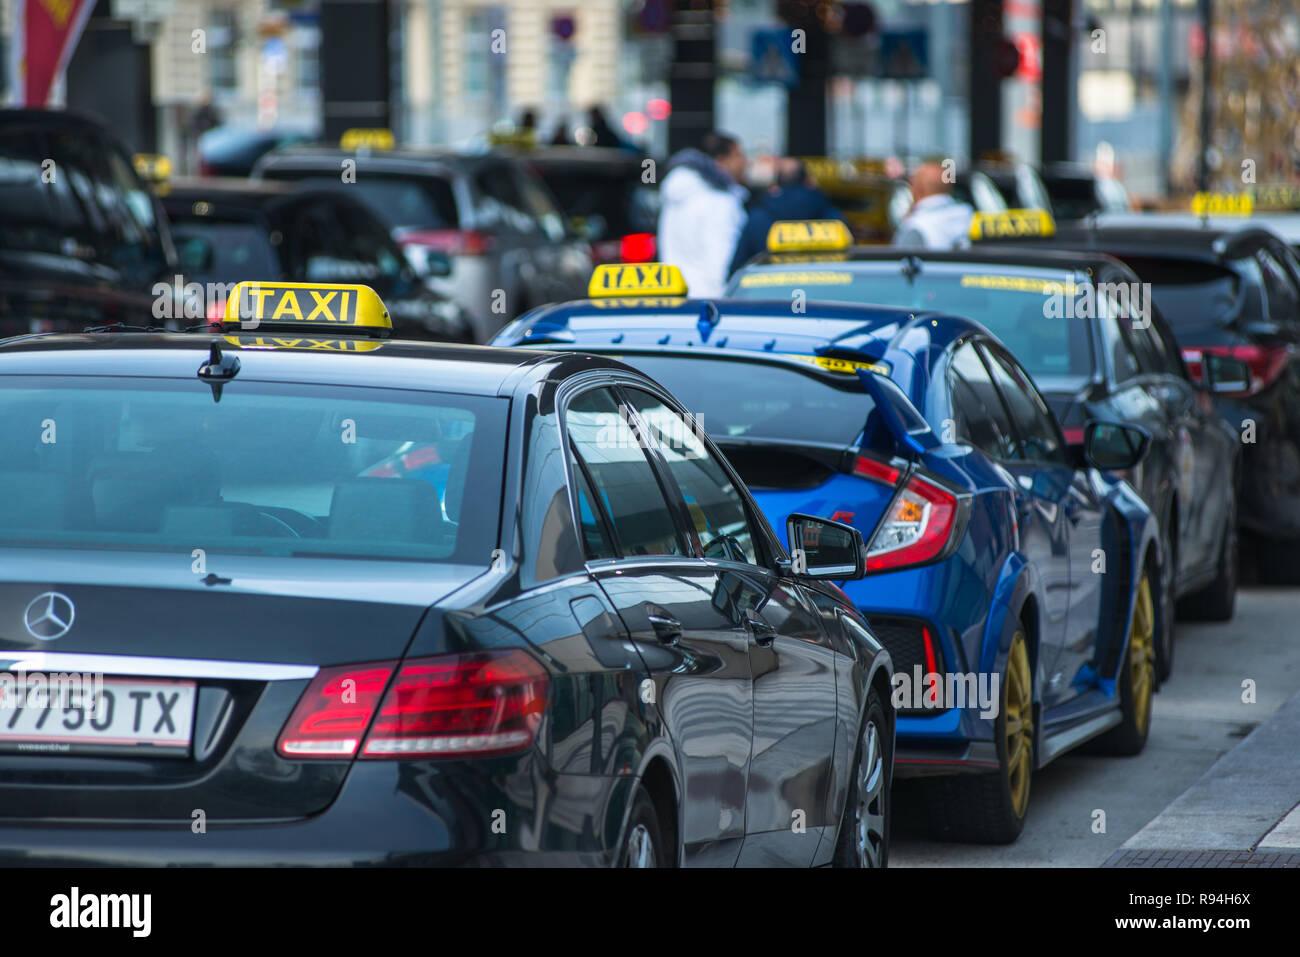 Taxi cabs at Hauptbahnhof railway station, Vienna, Austria - Stock Image